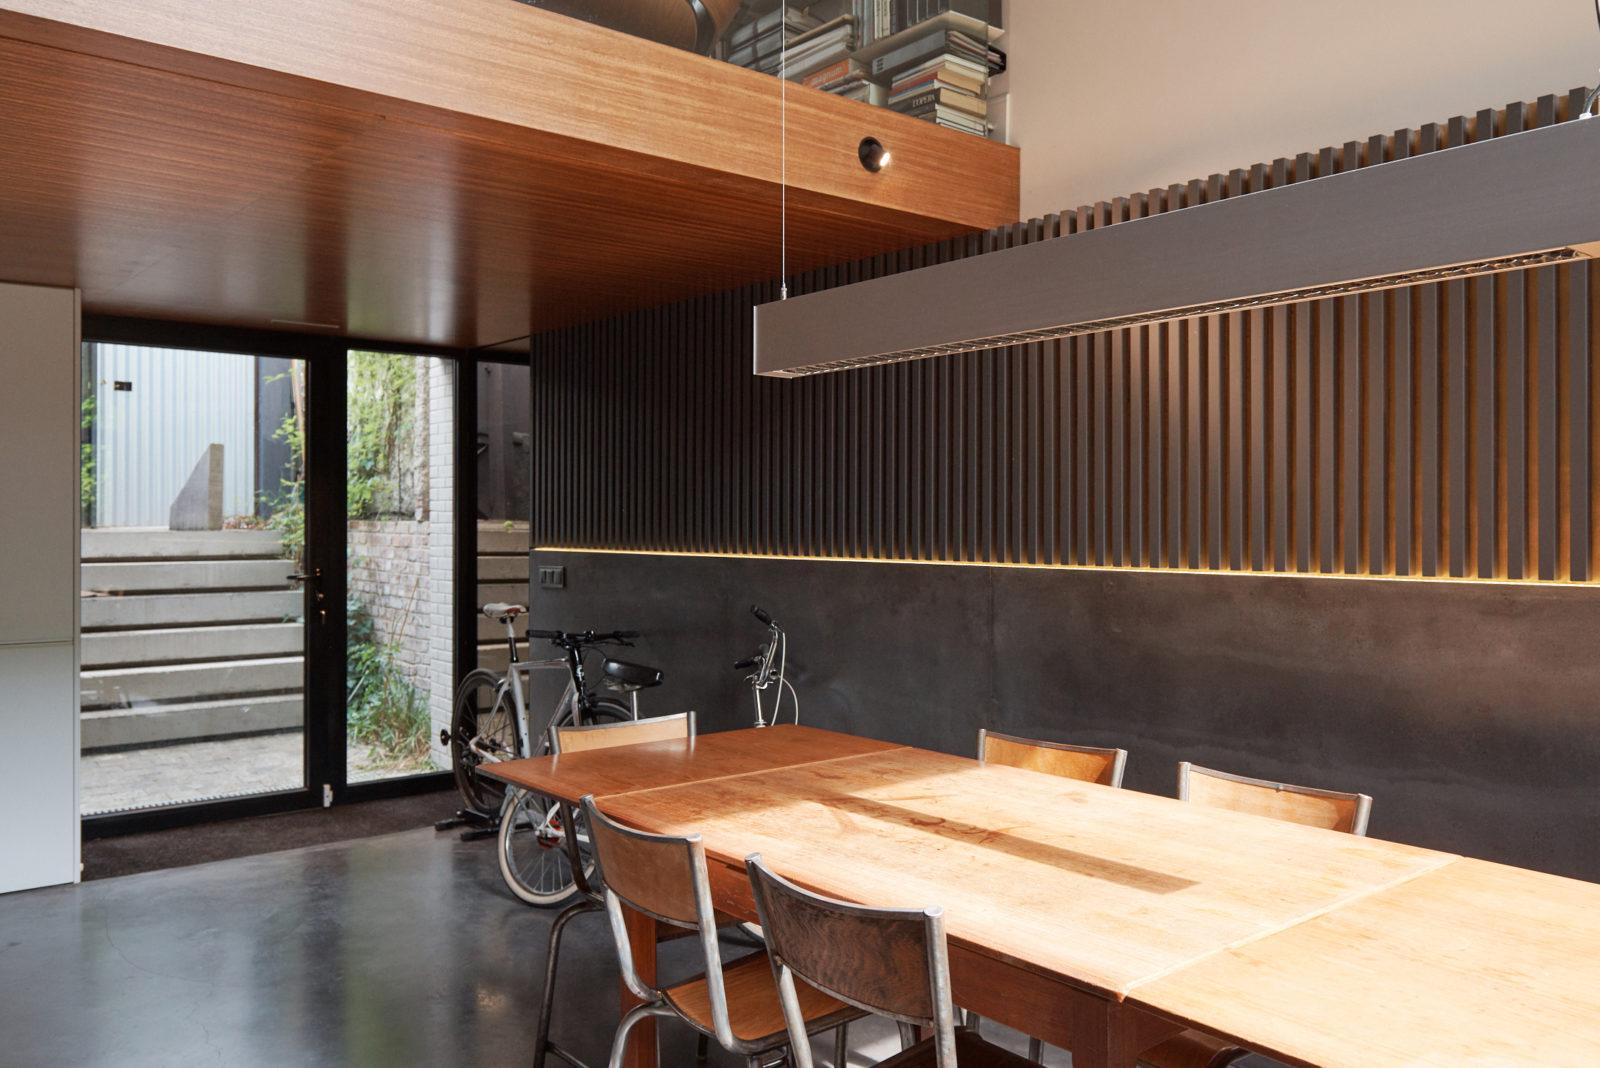 Ensa Paris Val De Seine architect antonin ziegler transforms humble structures into